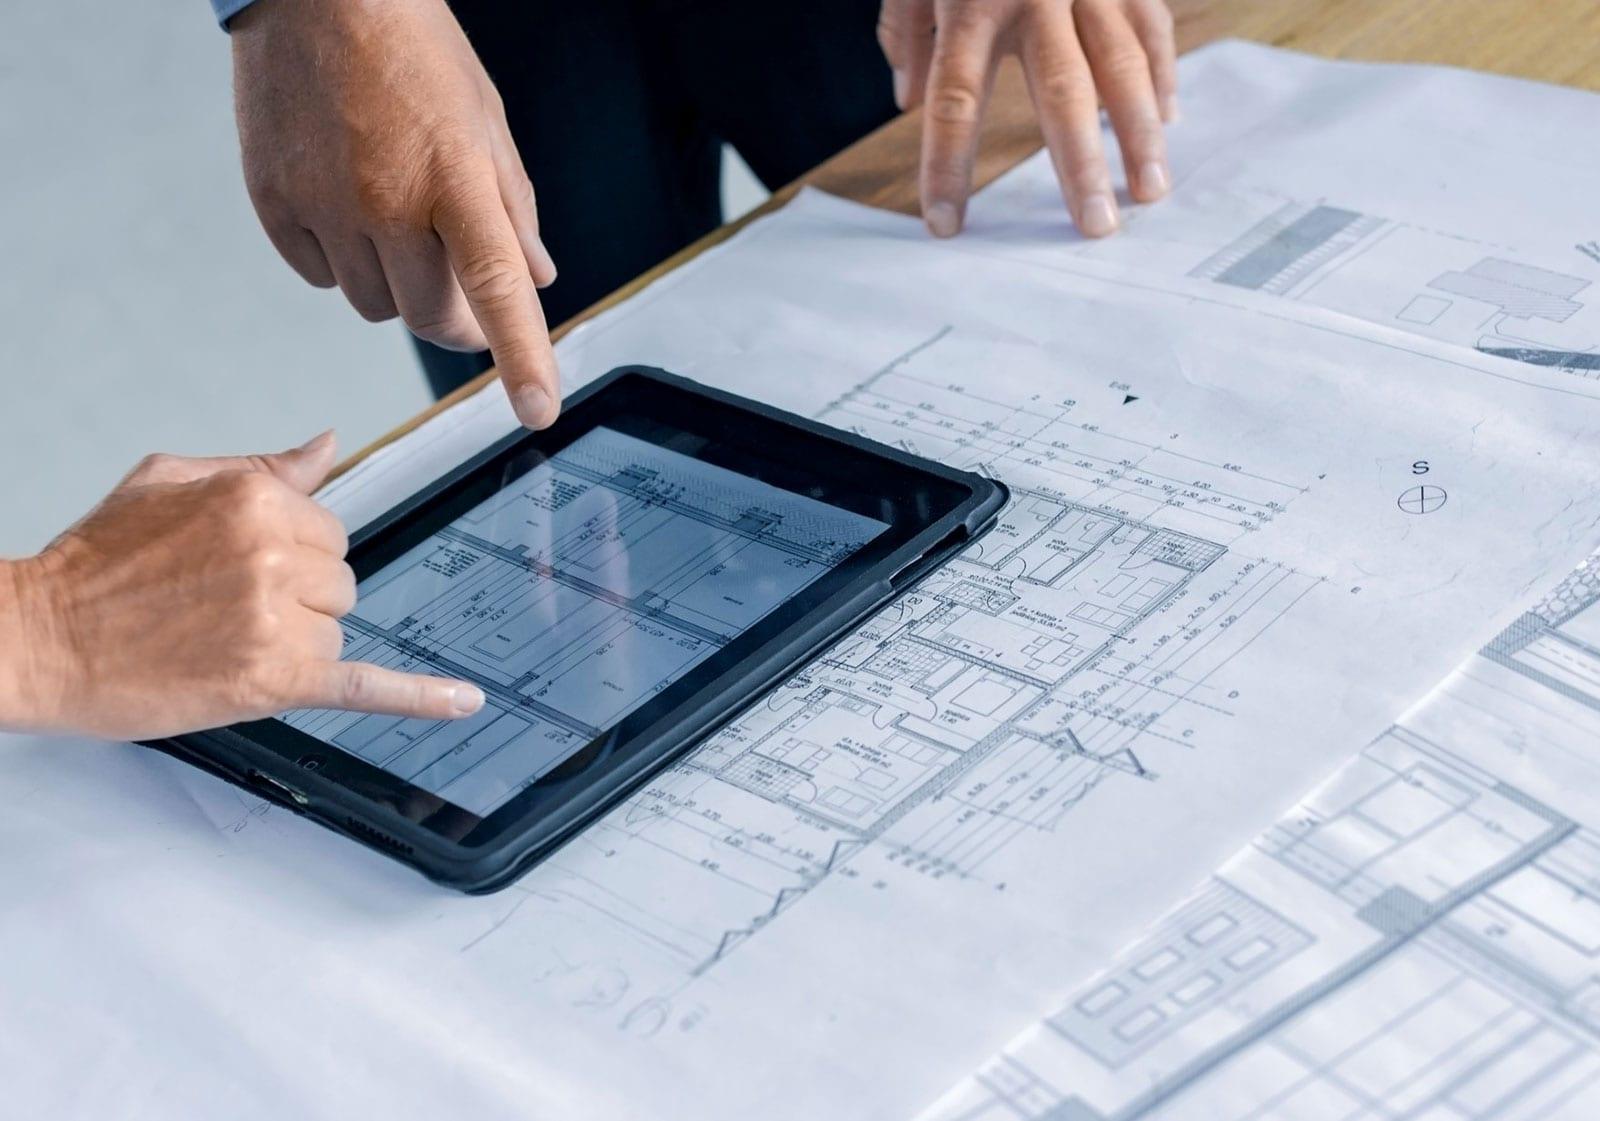 Planning application